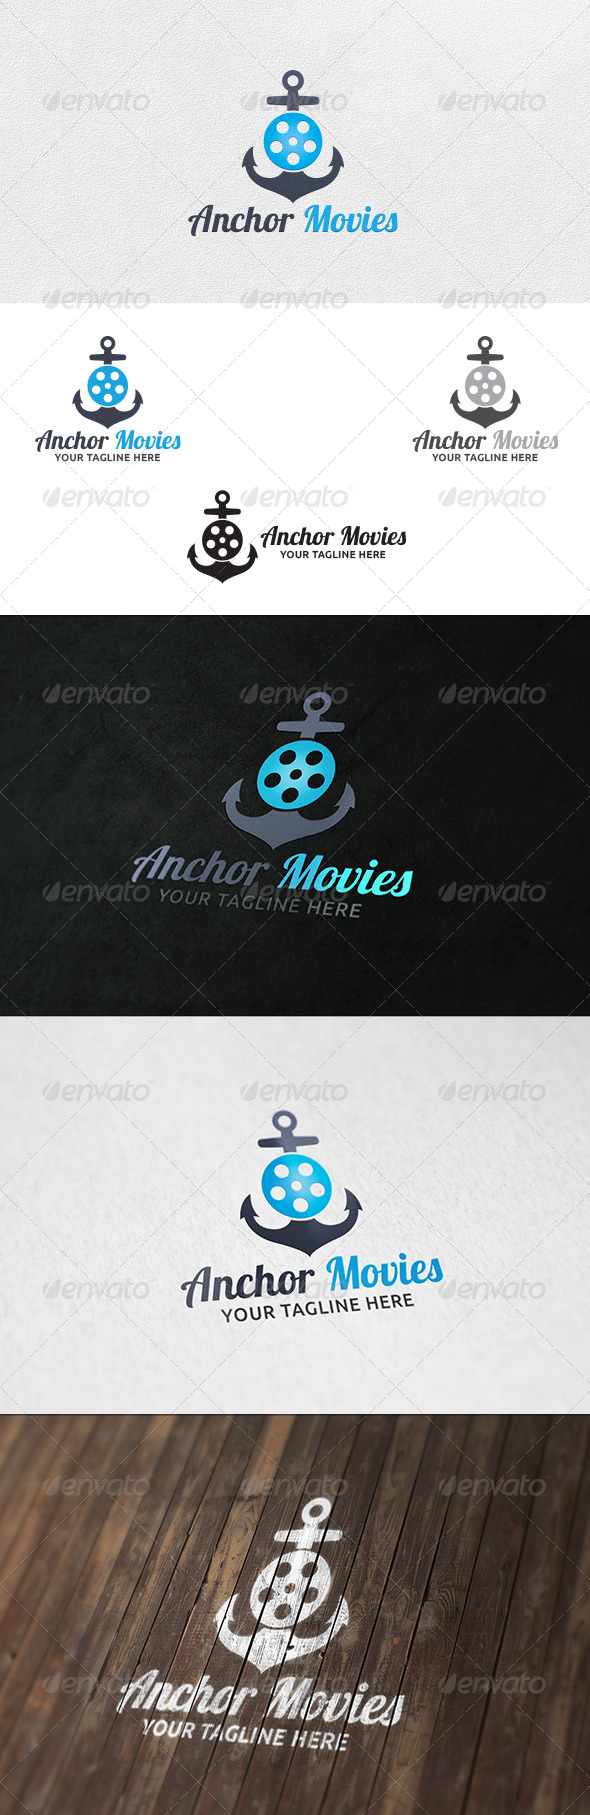 Anchor Movies - Logo Template